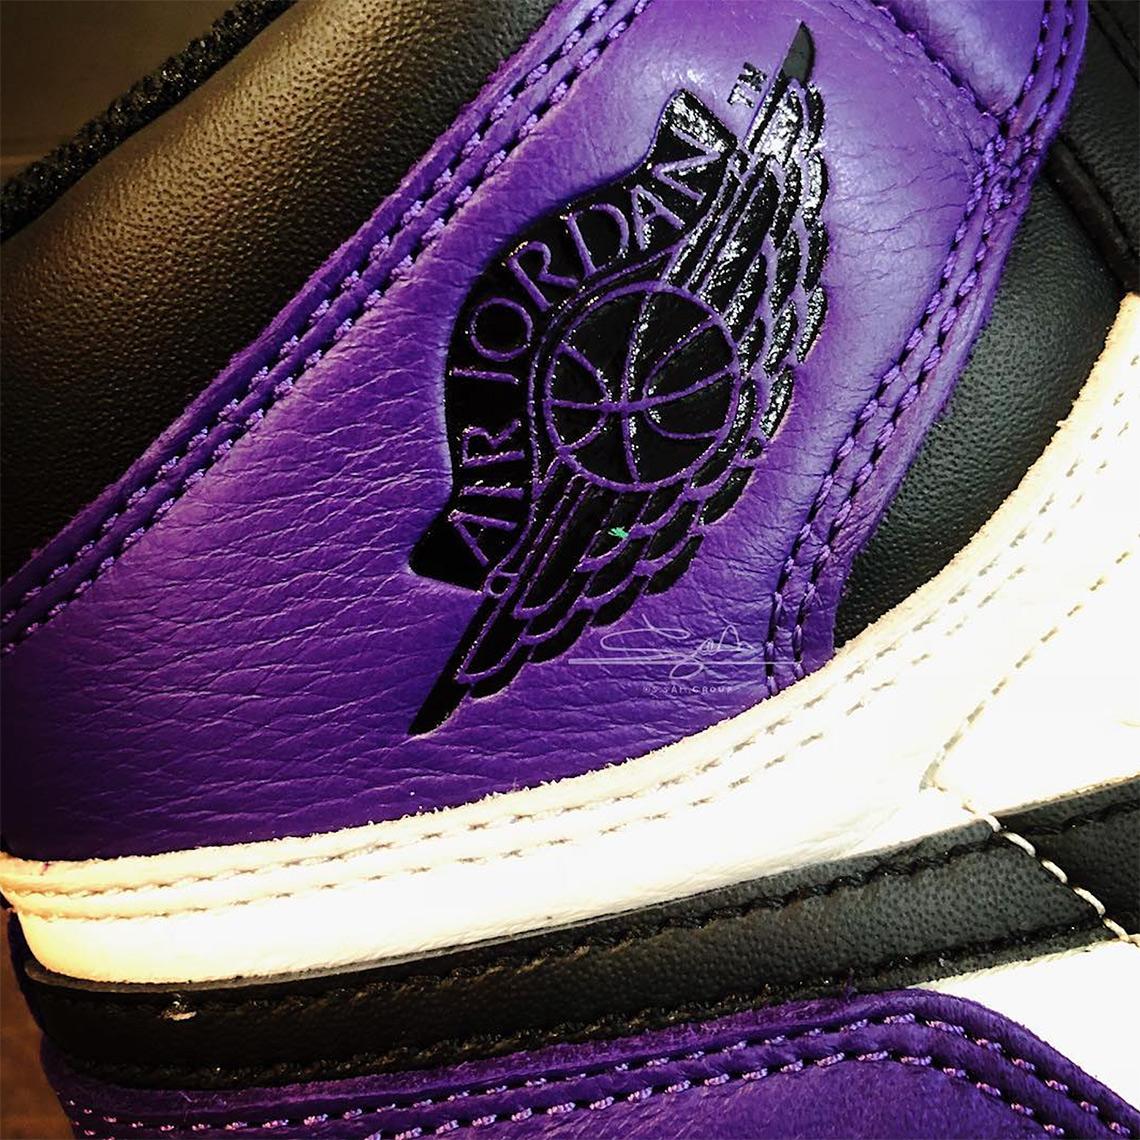 38d03a2ec7f1ad Air Jordan 1 Retro High OG Court Purple Release 555088-501 Info ...